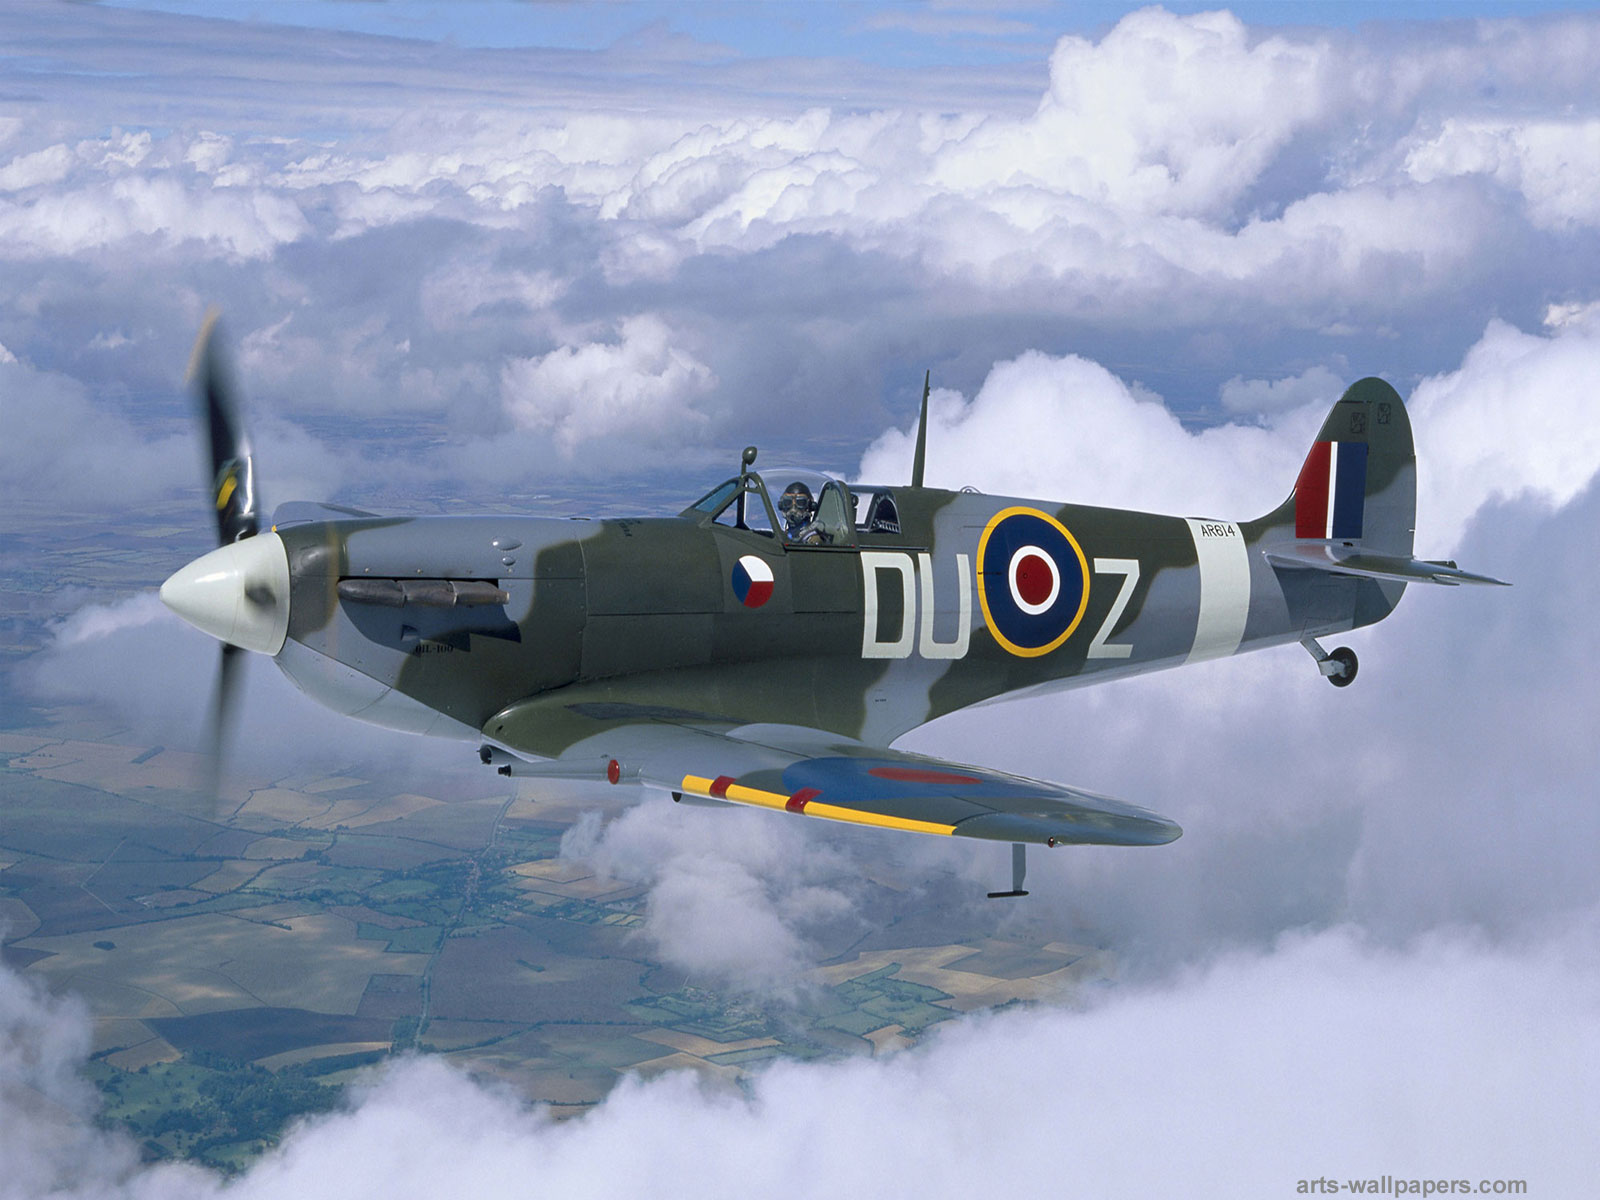 Pin Spitfire Wallpaper Hd Supermarine Aircraft Plane Clouds on 1600x1200